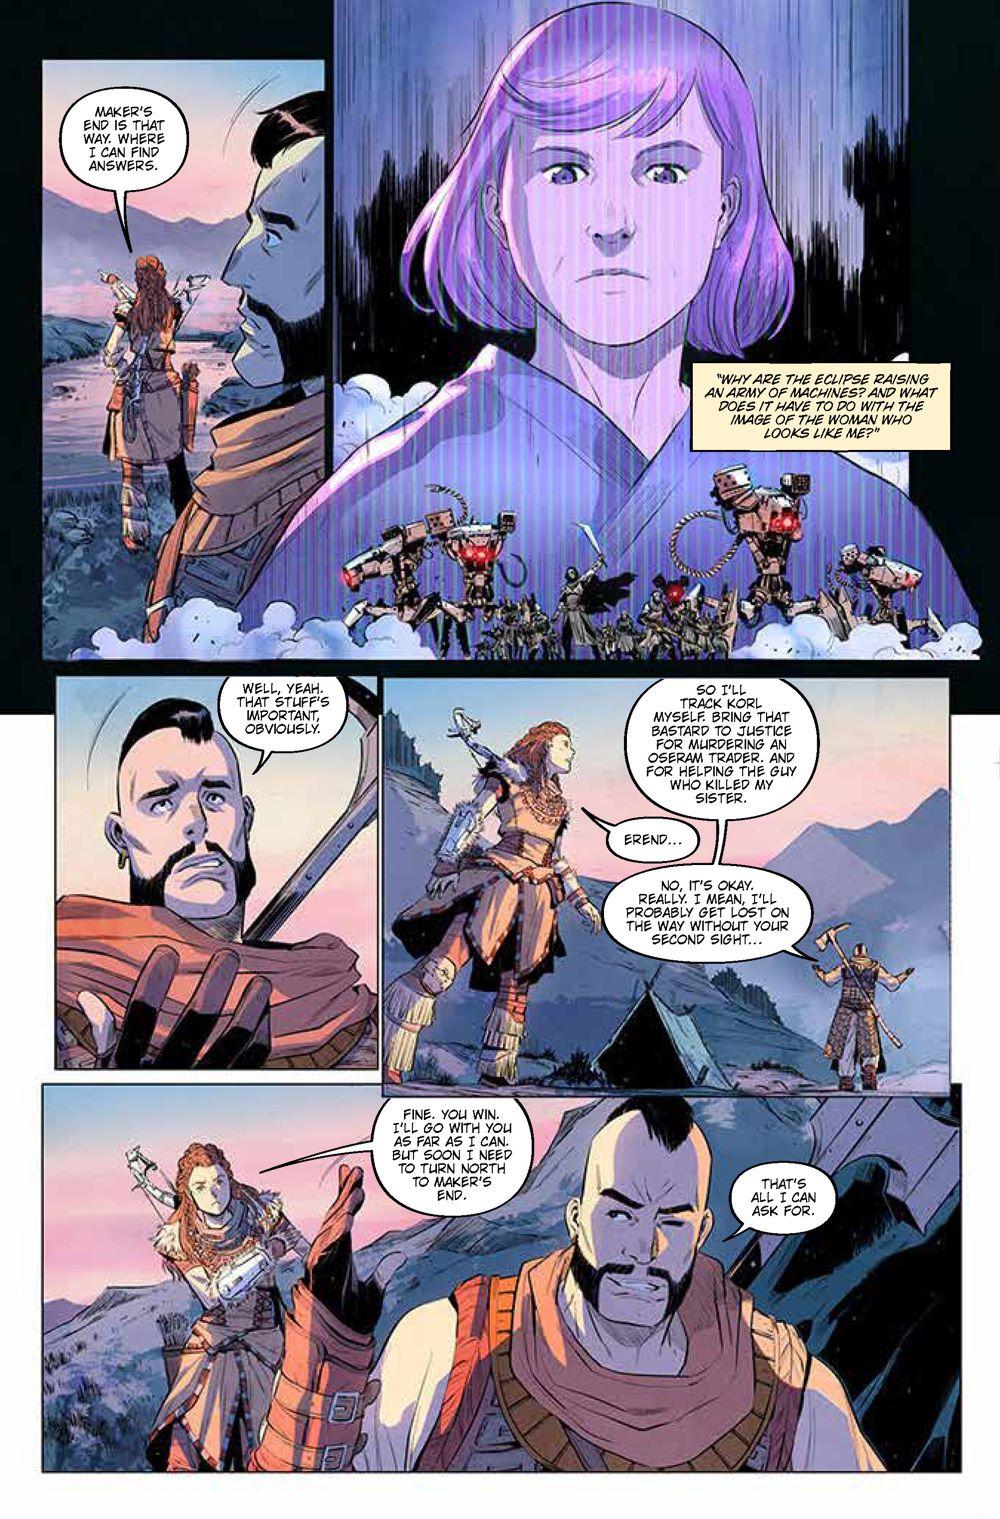 Pages-from-HorizonZeroDawn2.1_1 ComicList Previews: HORIZON ZERO DAWN LIBERATION #1